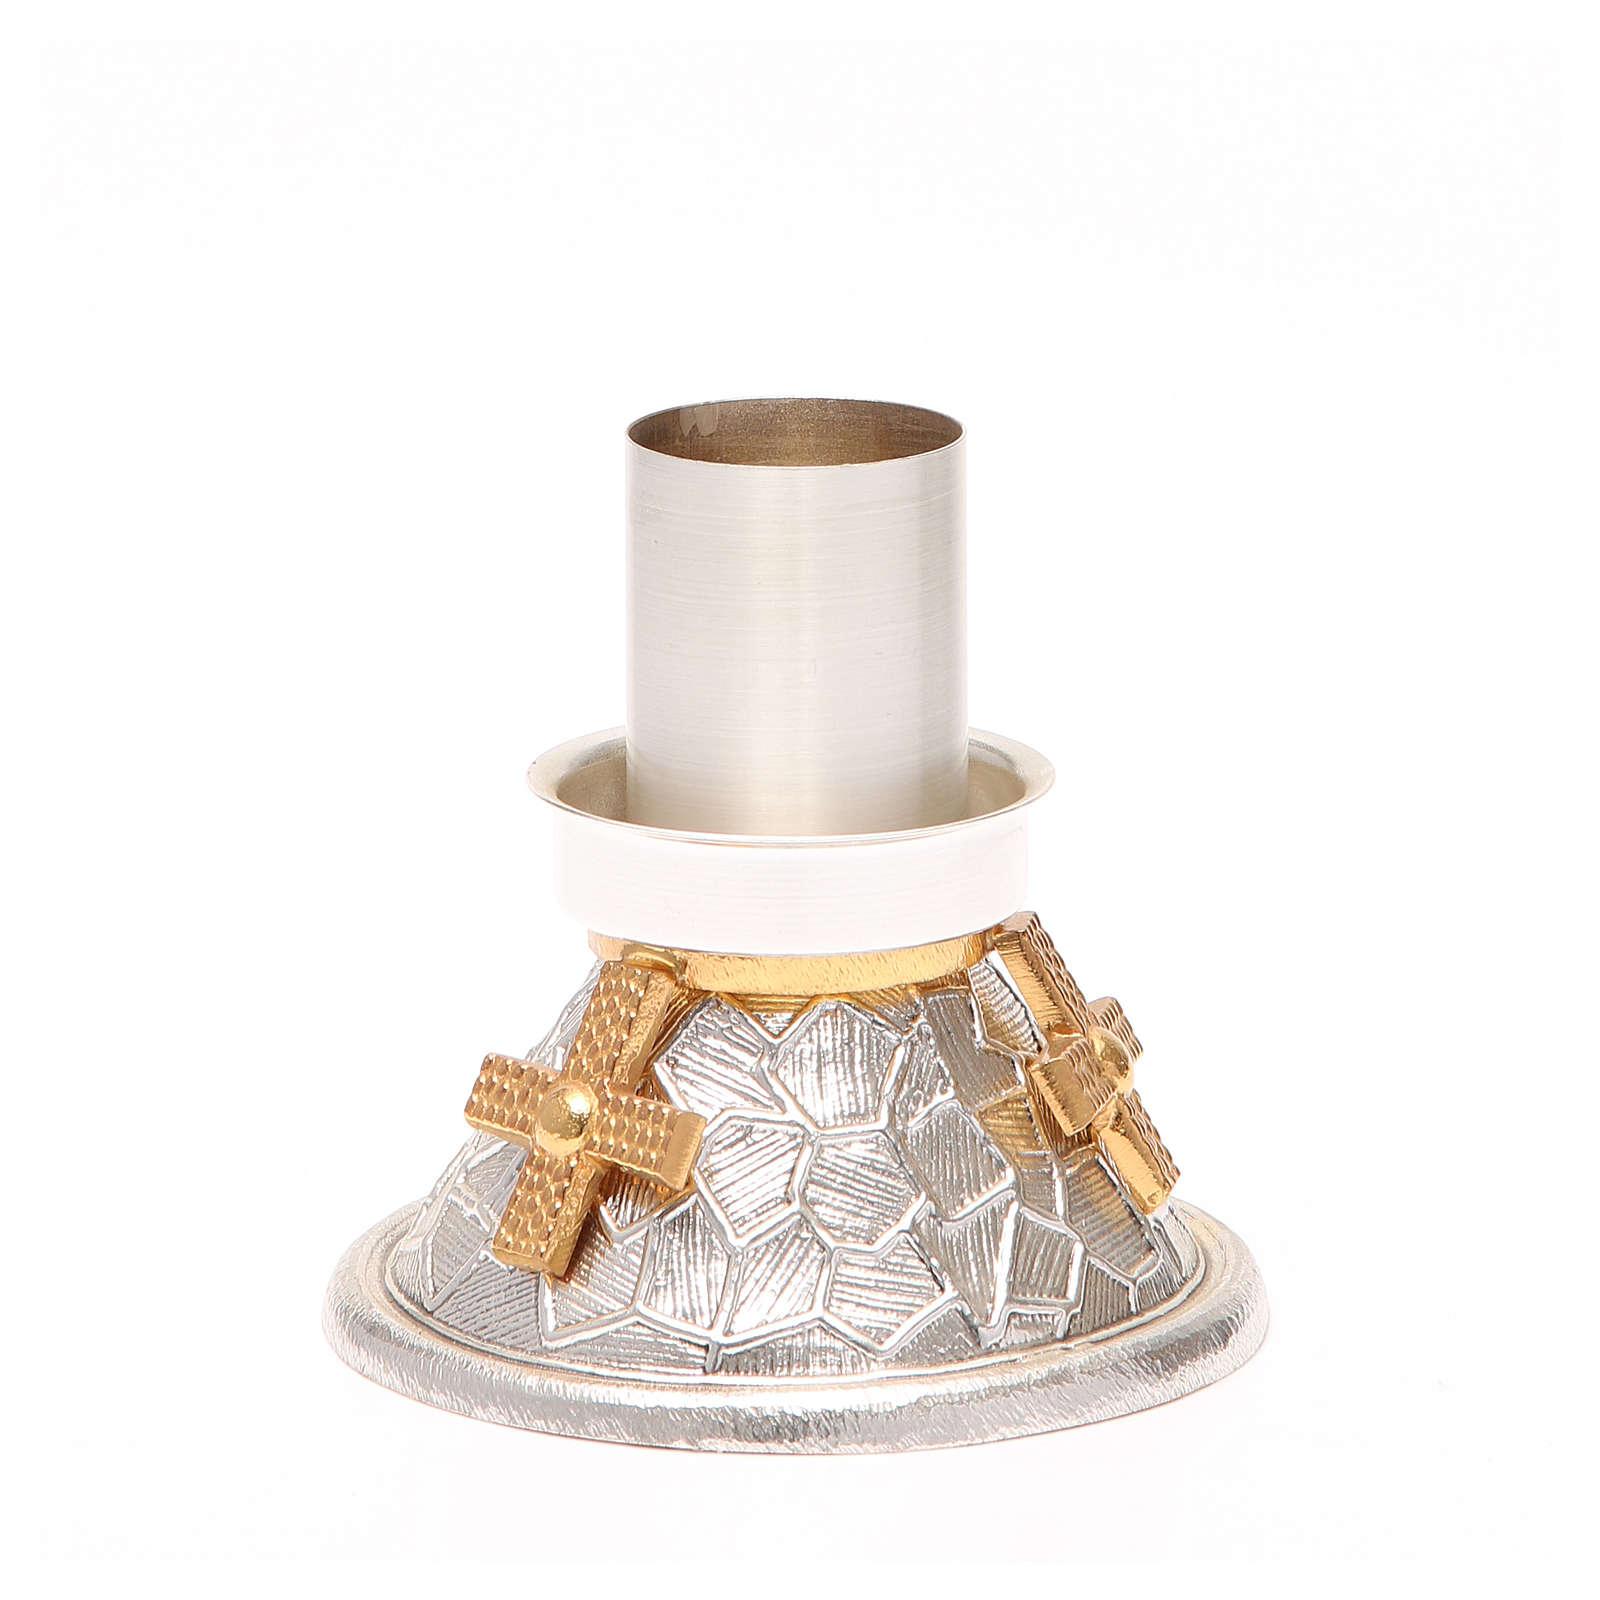 Altar candlestick golden crosses 4